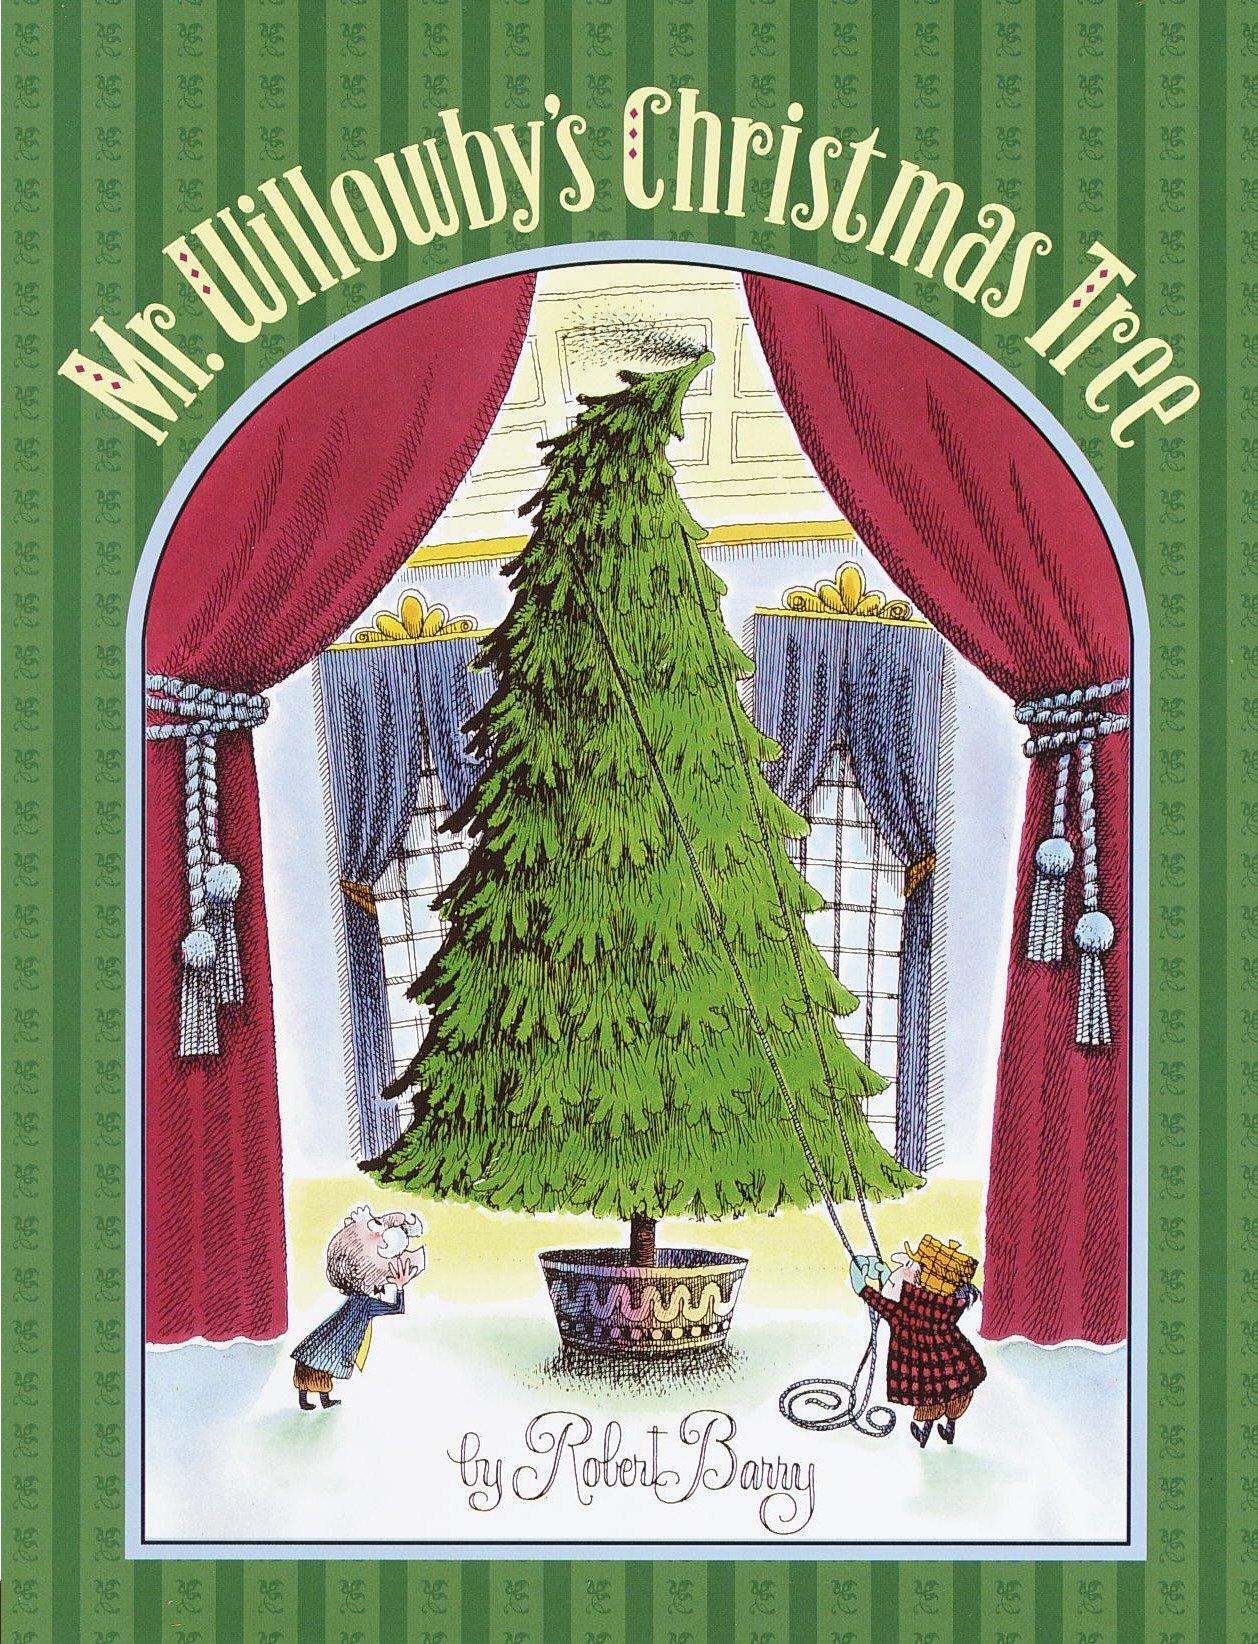 amazoncom mr willowbys christmas tree 9780385327213 robert barry books